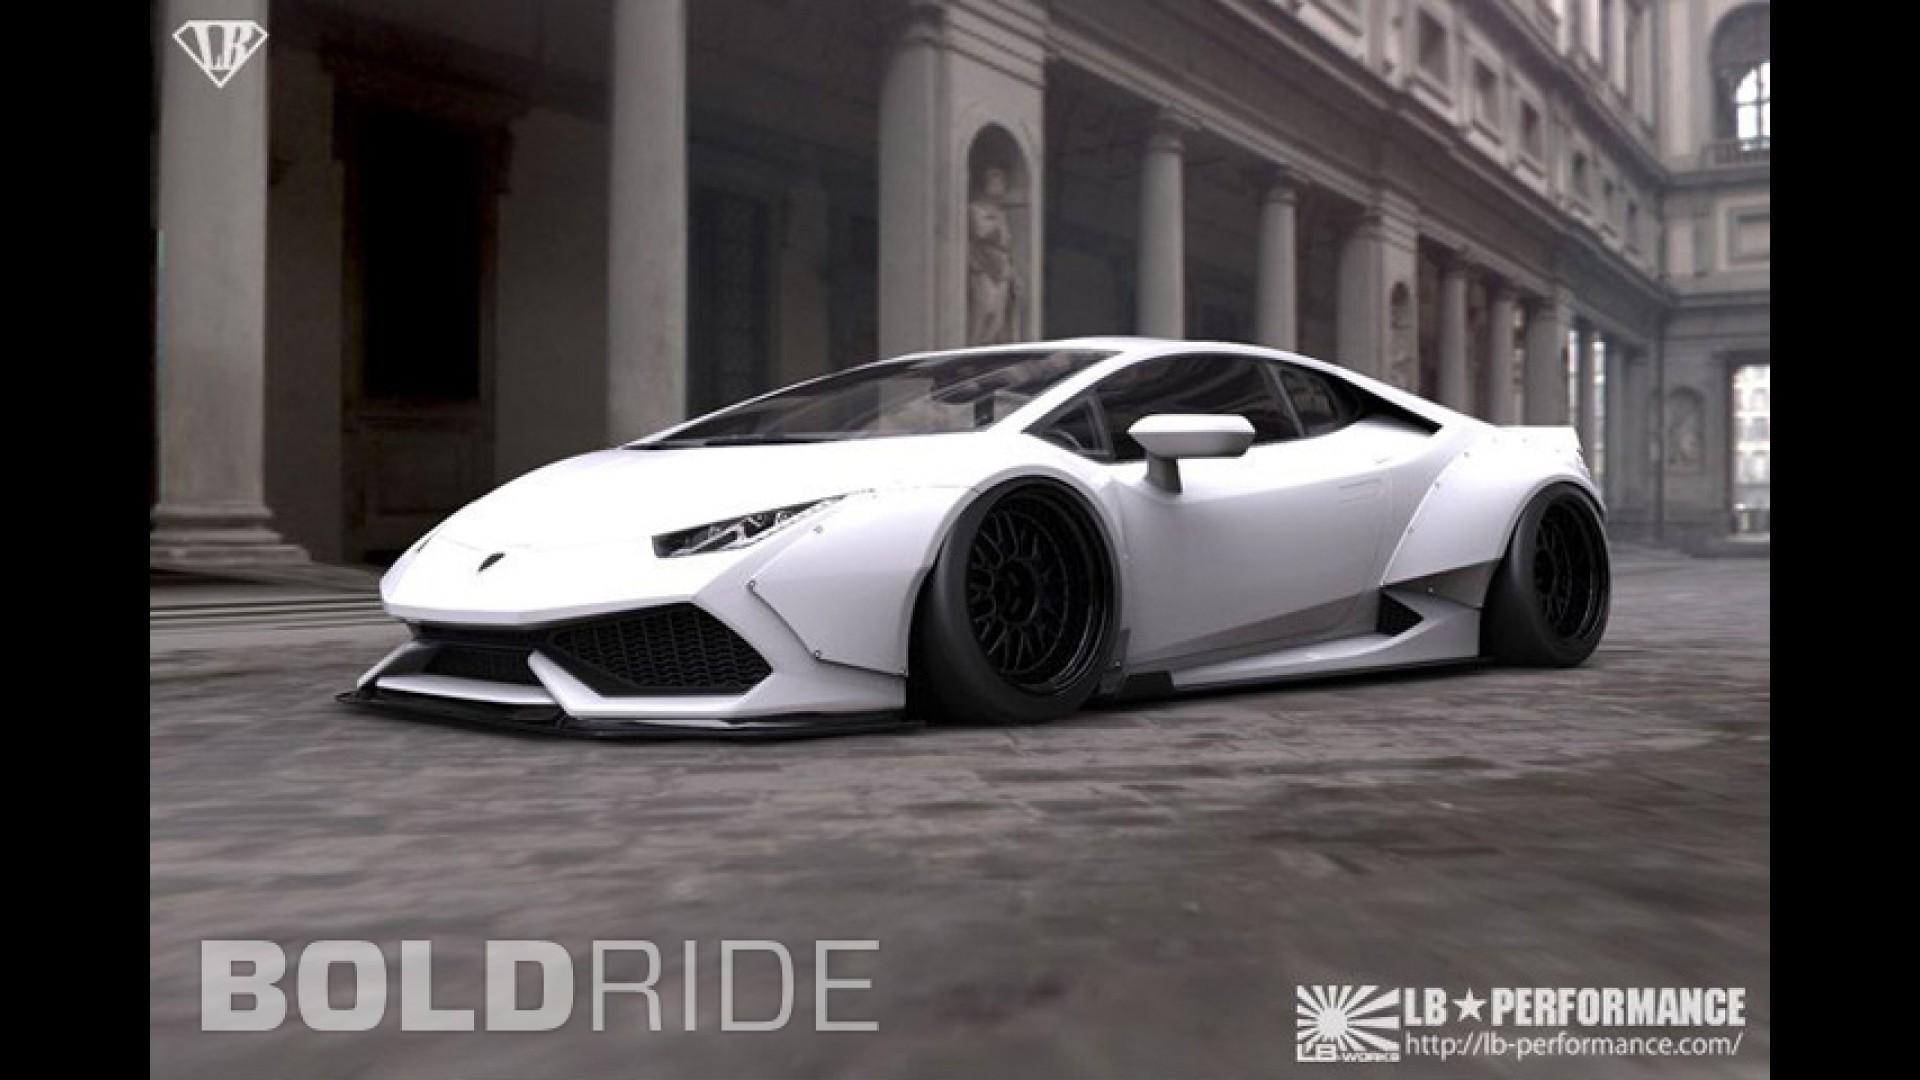 Lamborghini Aventador Cars Wallpapers Liberty Walk Wallpapers 84 Images